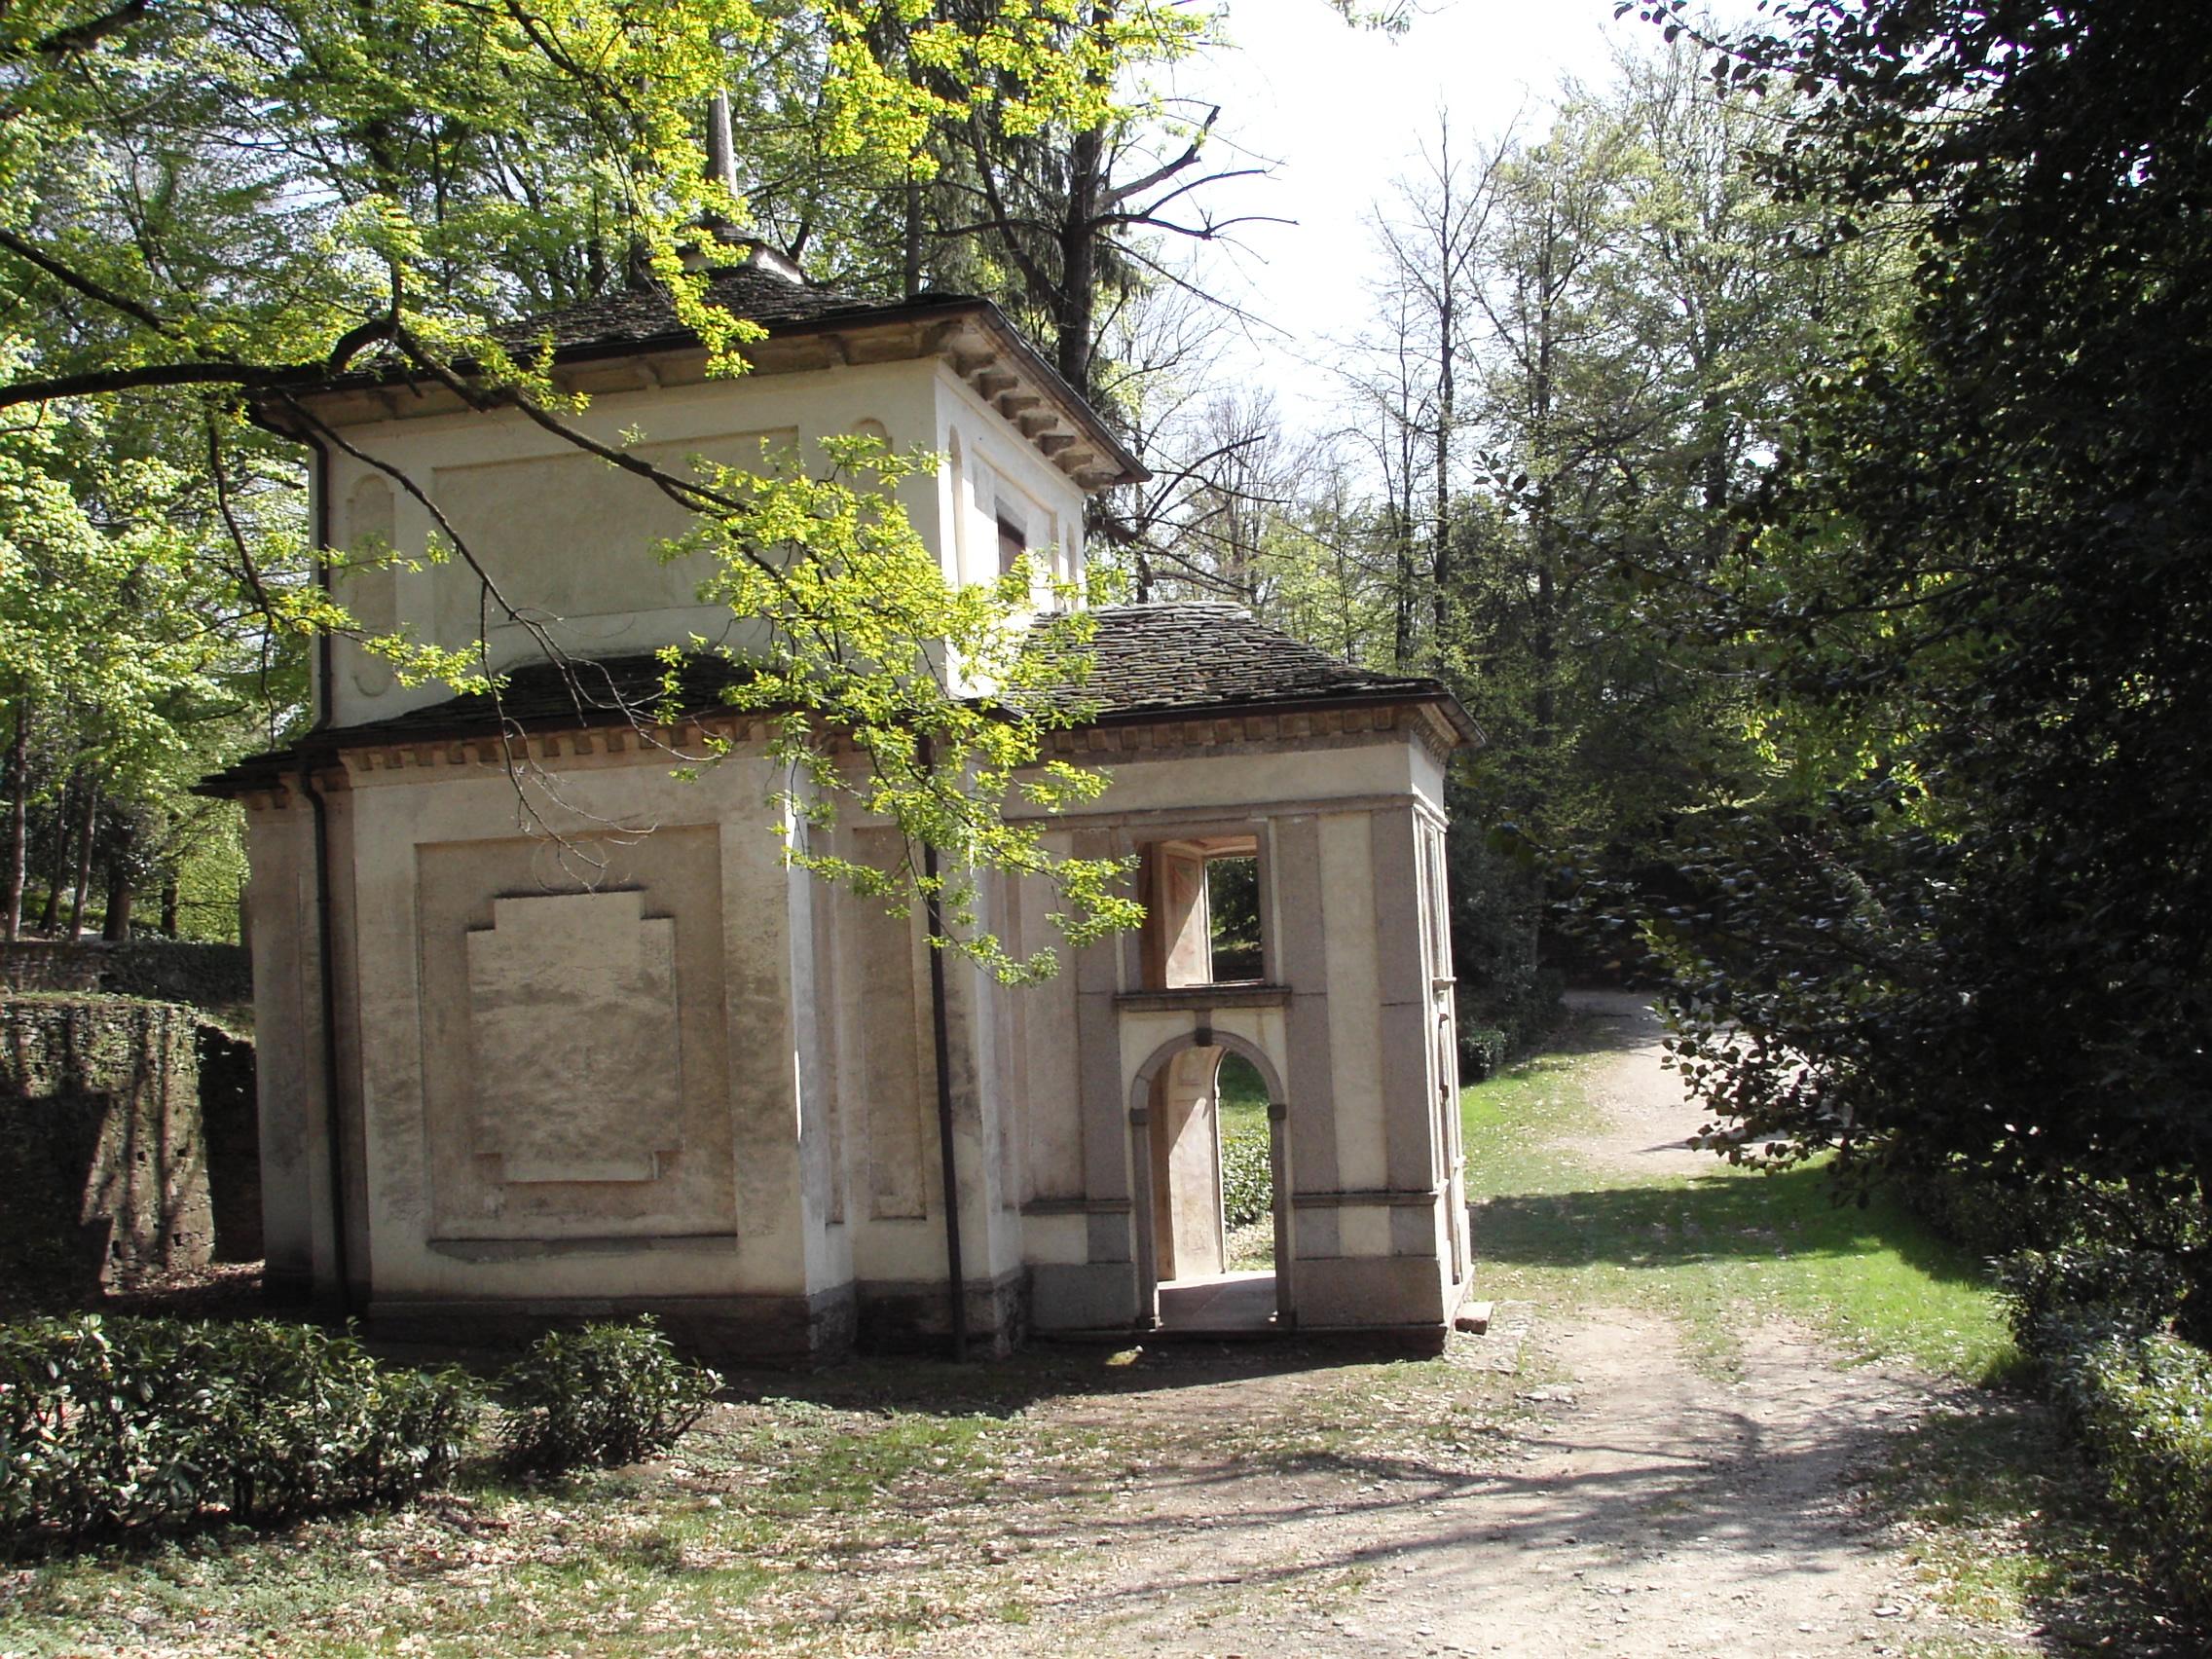 Orta – Sacro Monte (8)